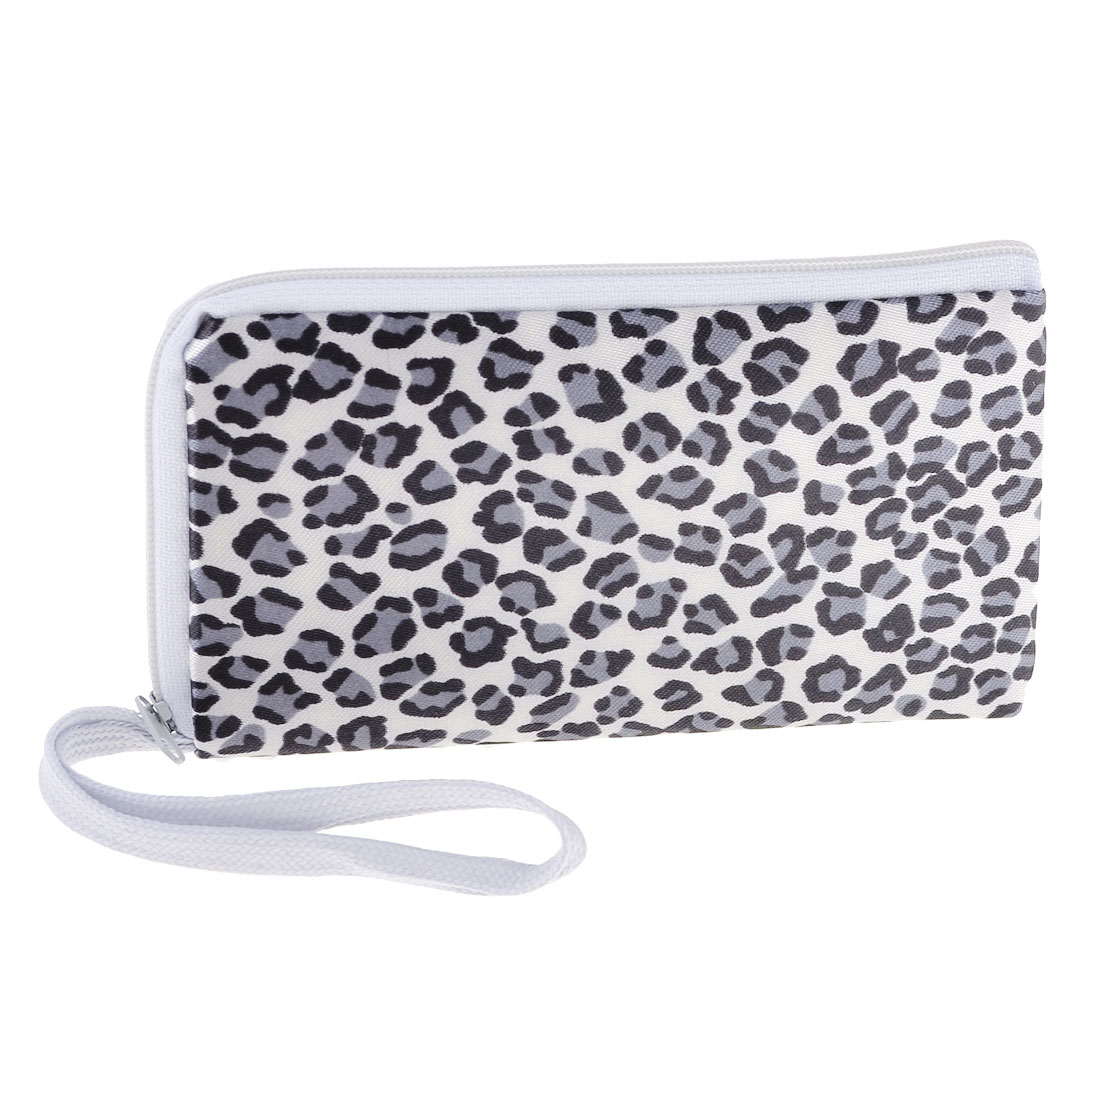 Ladies Black Gray Leopard Printed Double Zip Up Keys Phone Bag White w Wristlet